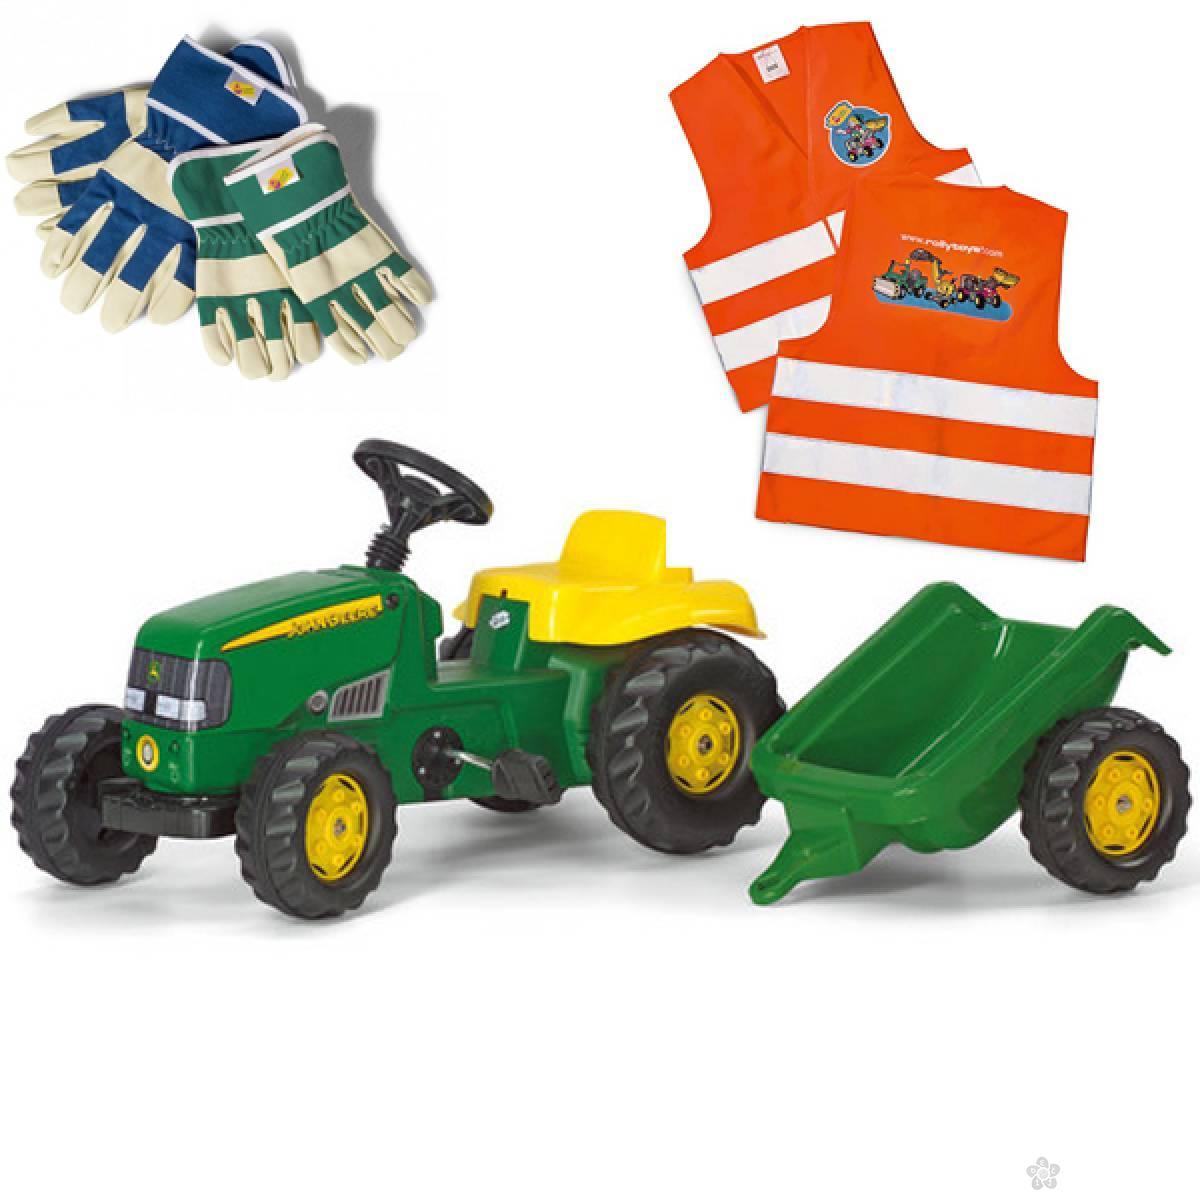 Traktor Rolly kid John Deere i prikolica 012190